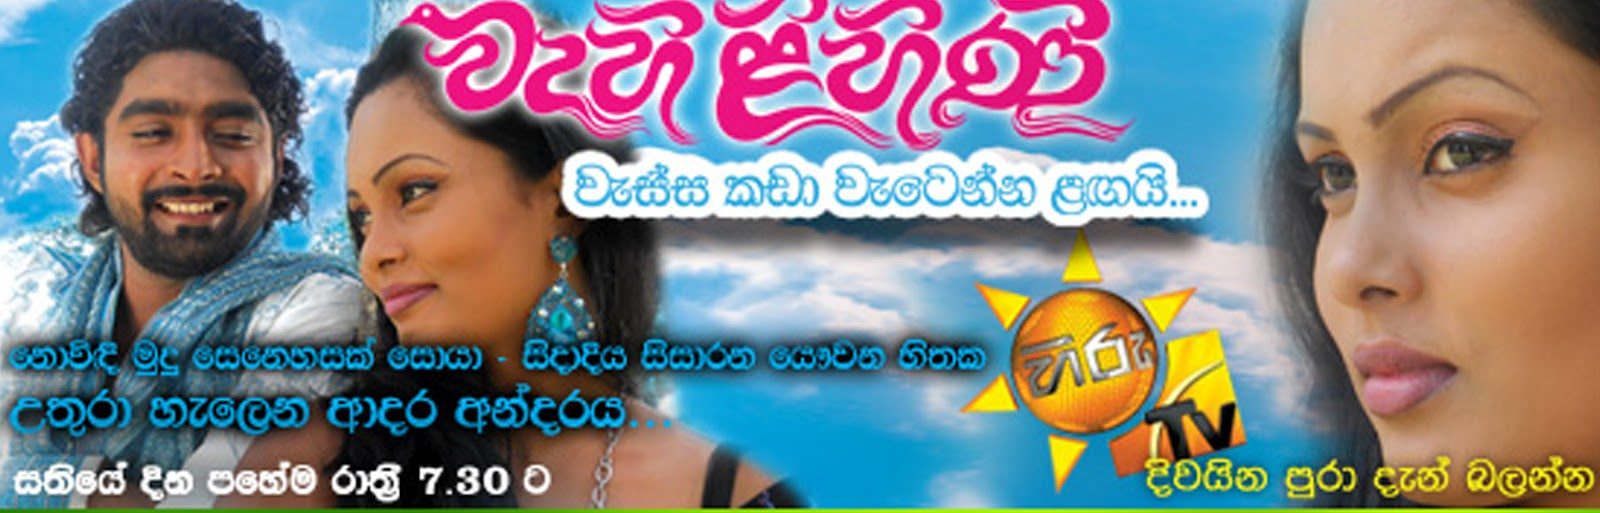 Pin Sinhala Teledrama Movies Films Bahuboothayo Film on Pinterest